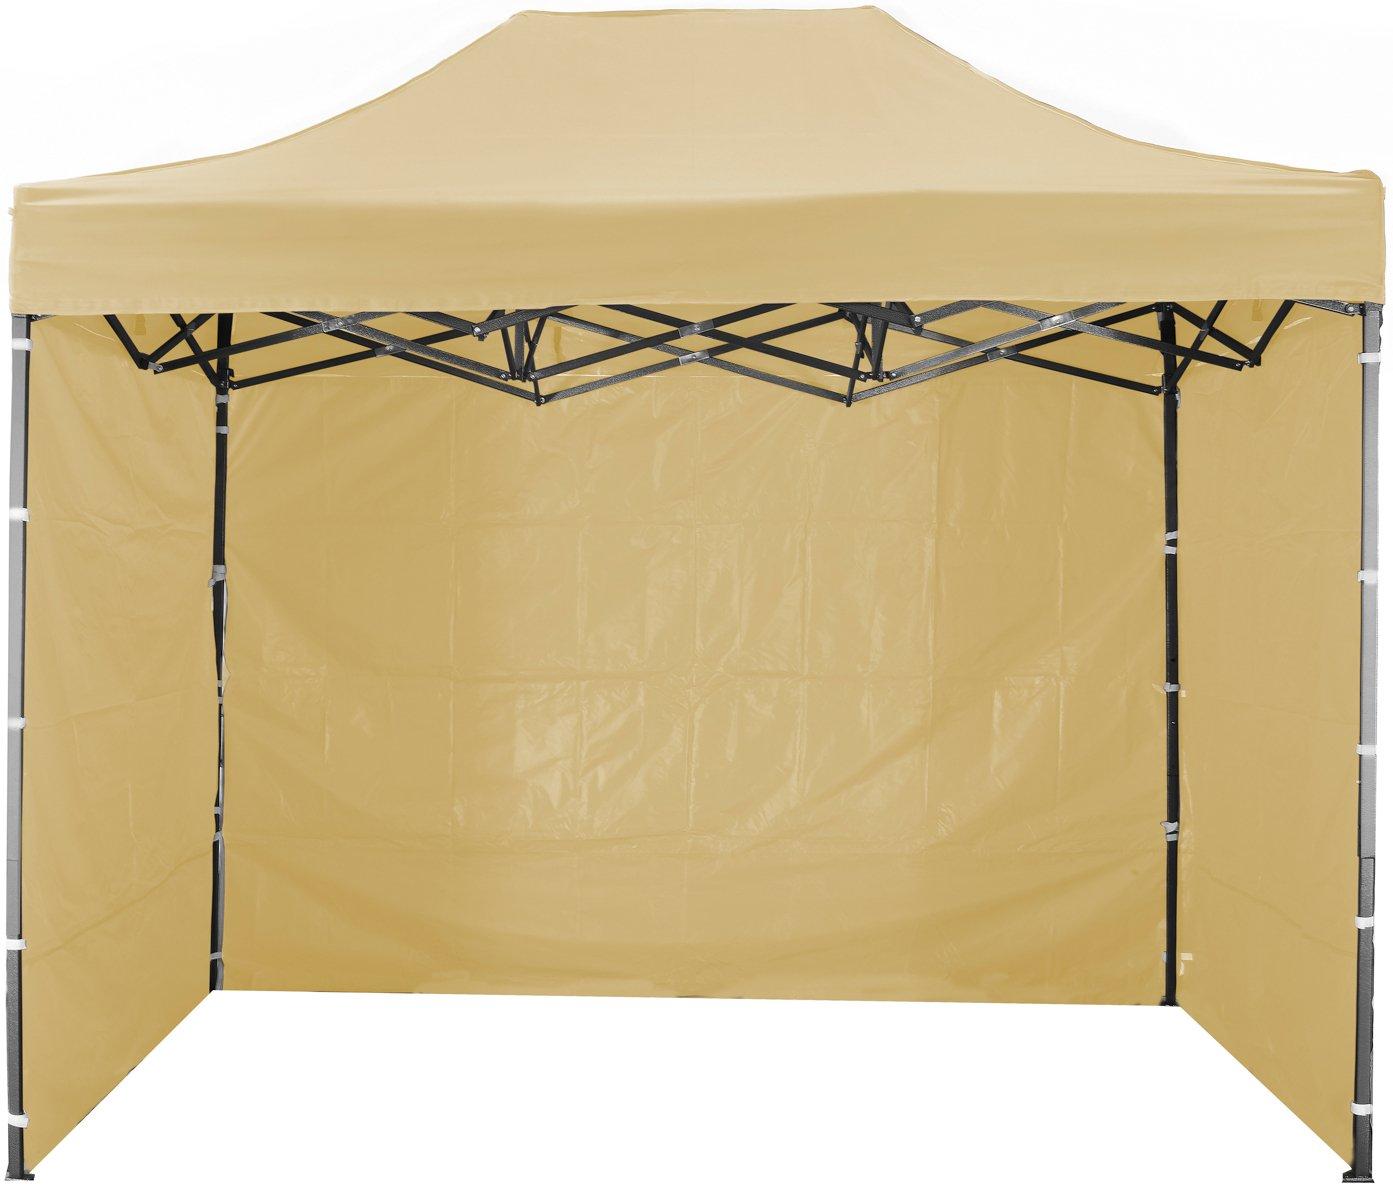 Aga24Gazebo Pop Up 2x3m party tent, garden tent, Falltzelt Stall, Market Stalls, Marquee